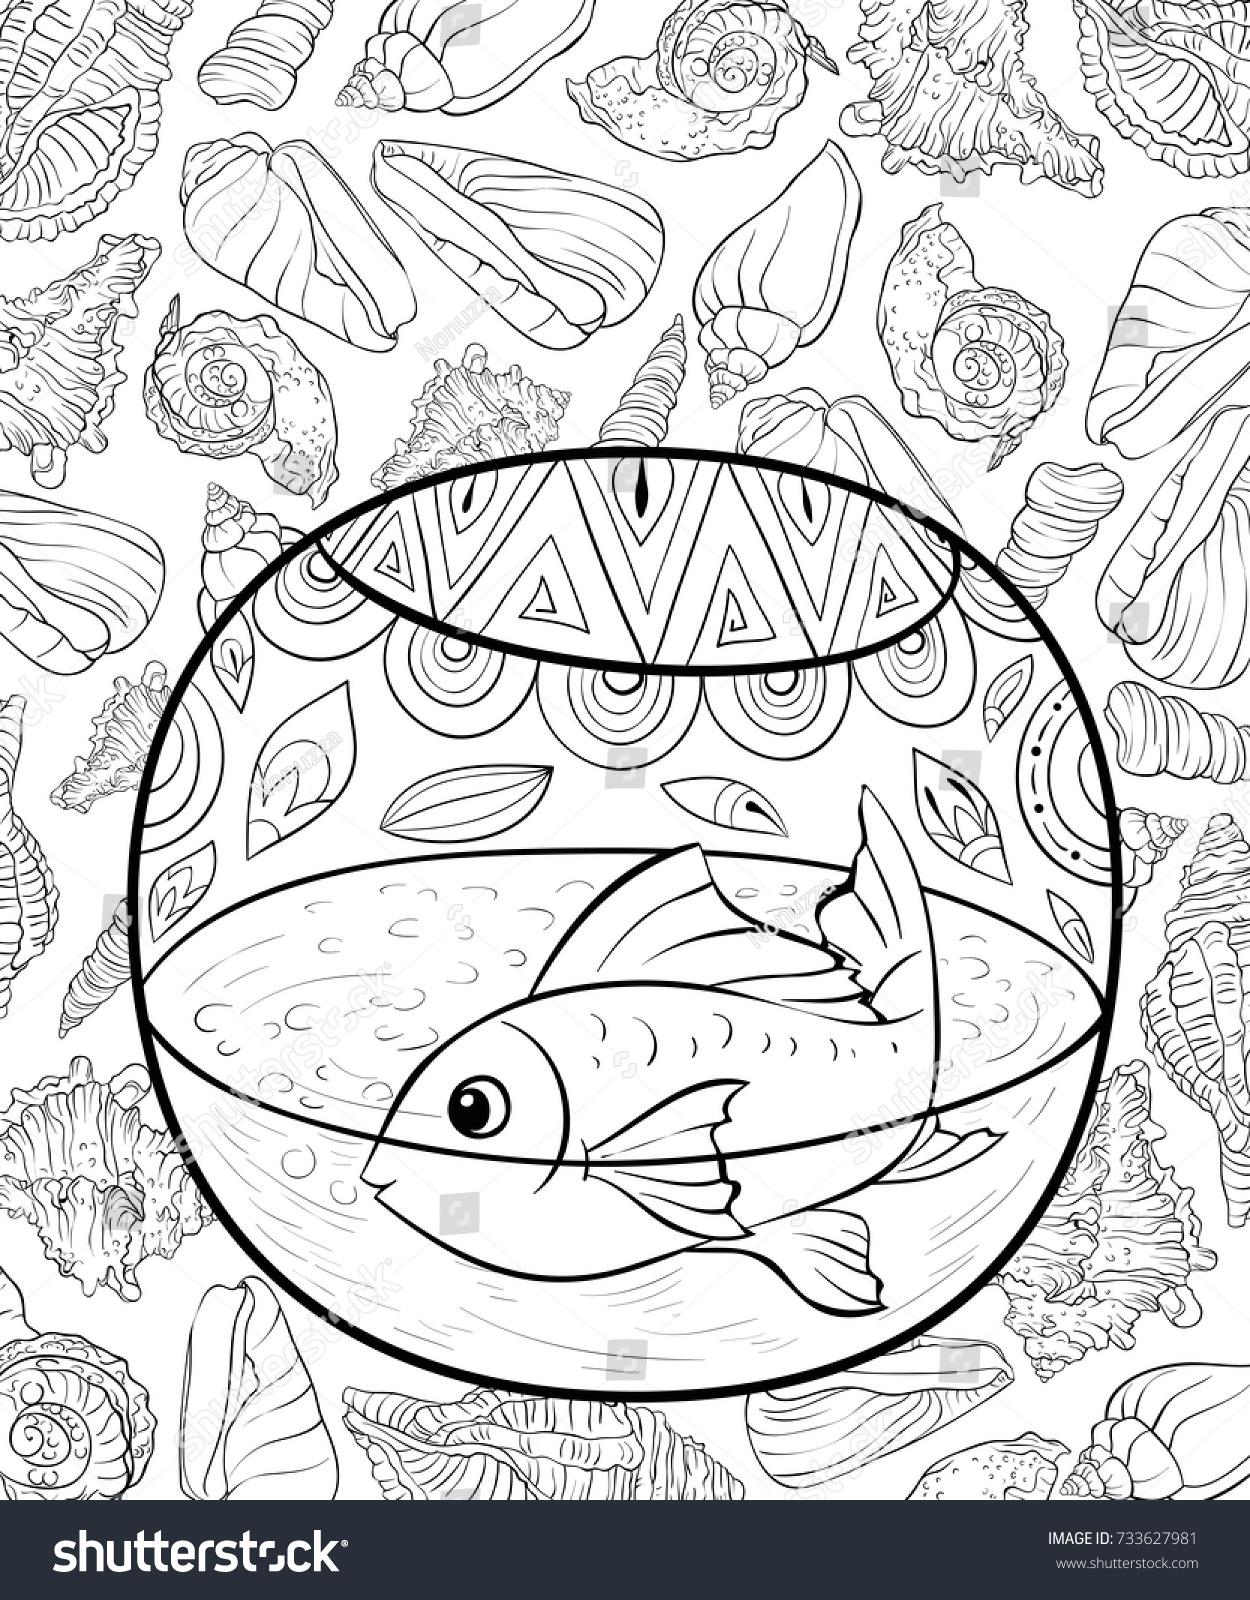 Adult Coloring Pagebook Fish Aquarium Background Stock Vector ...